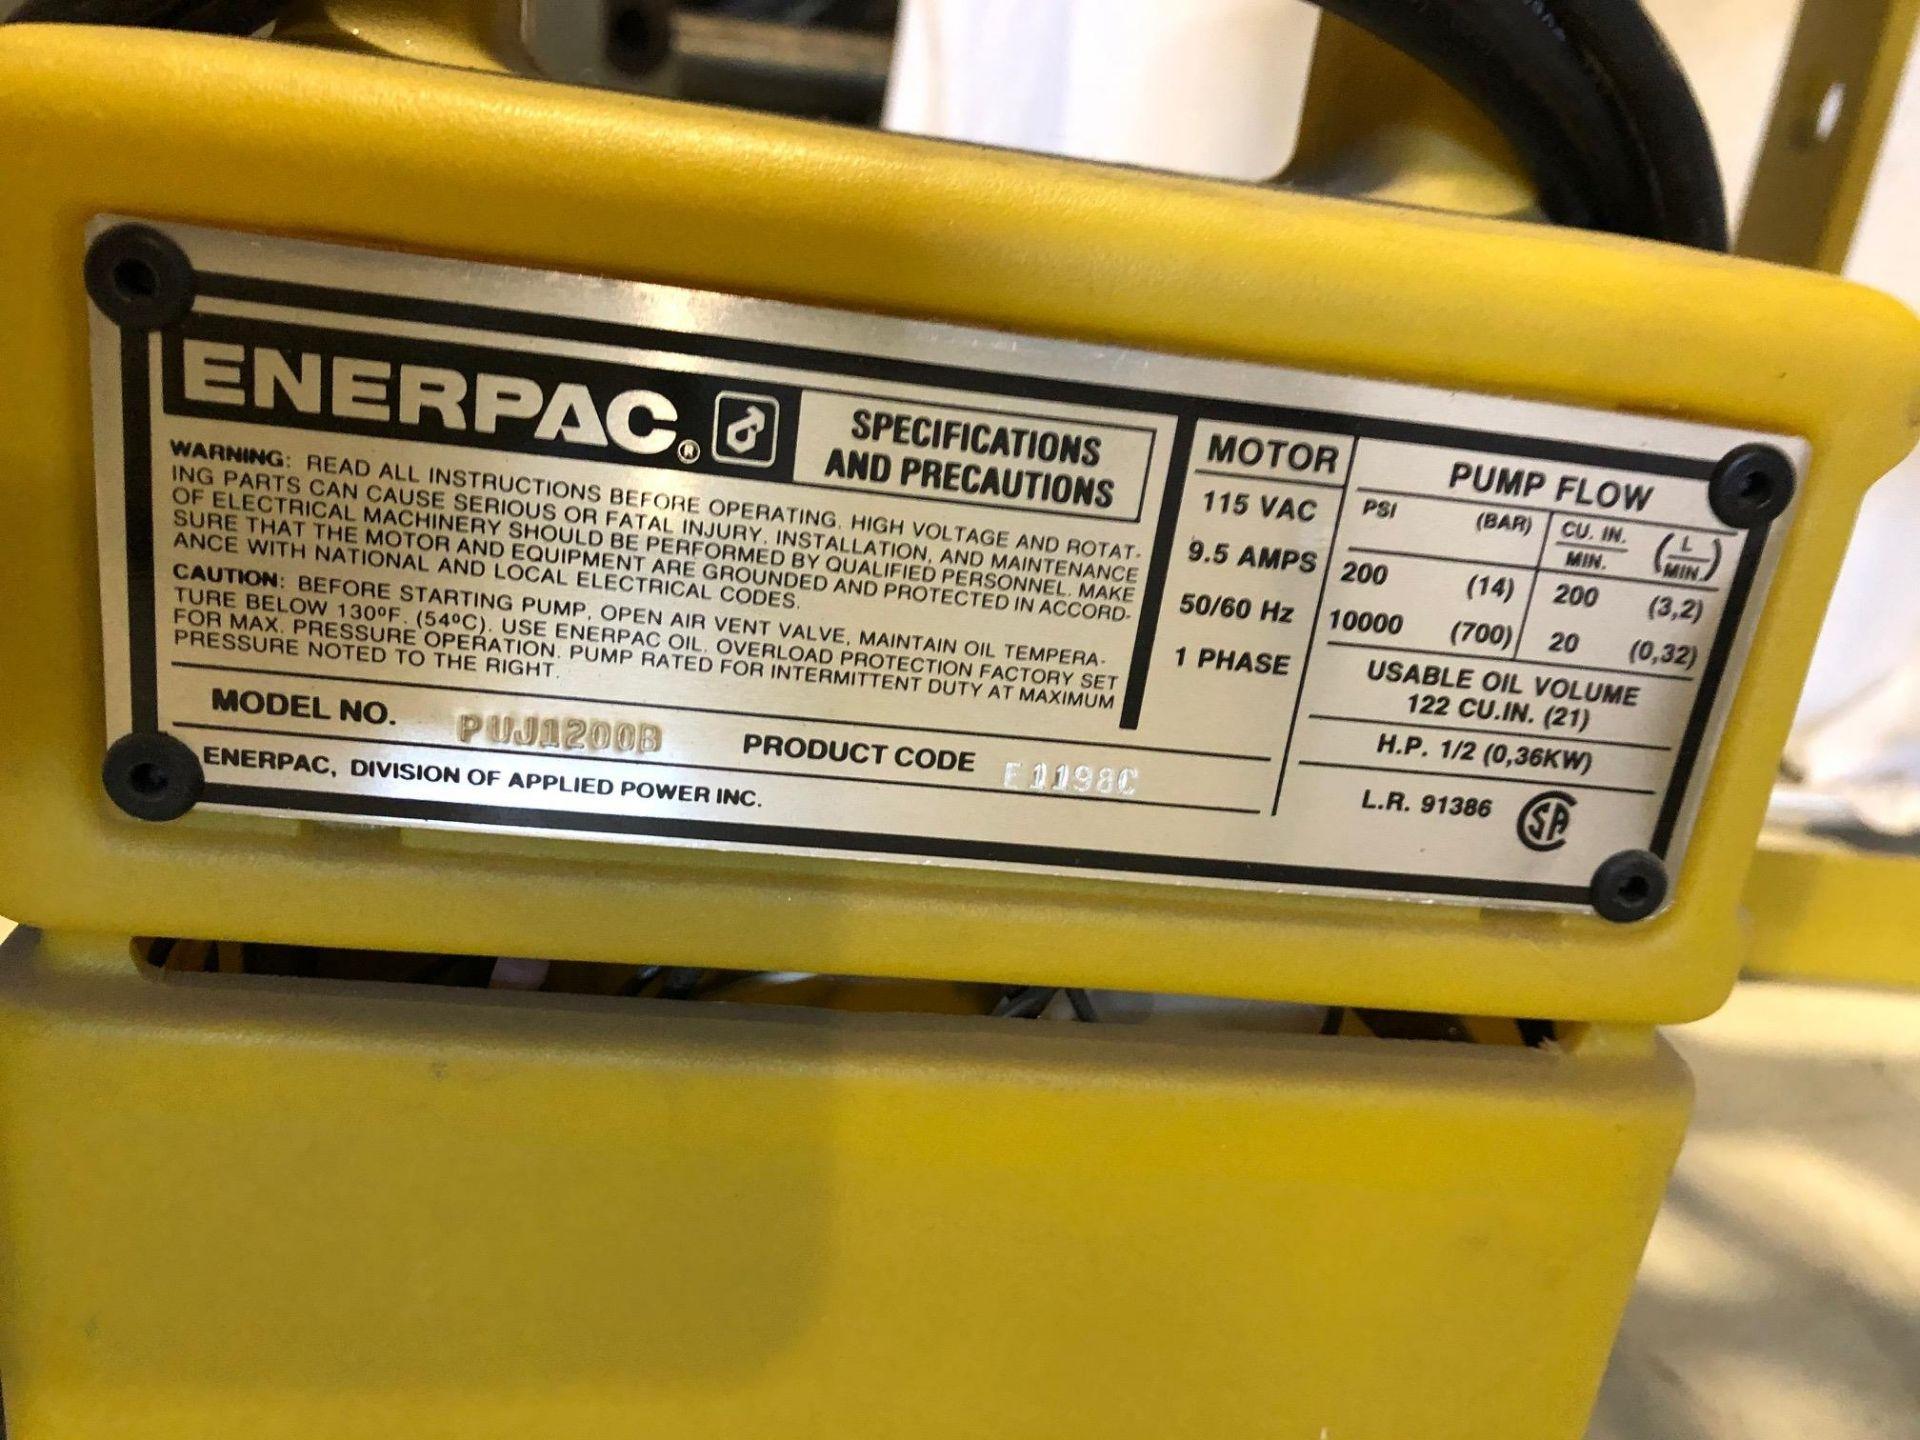 ENERPAC SHOP PRESS, MODEL C215900, S/N E119C, 15 TON - LOCATION, MONTREAL, QUEBEC - Image 4 of 5